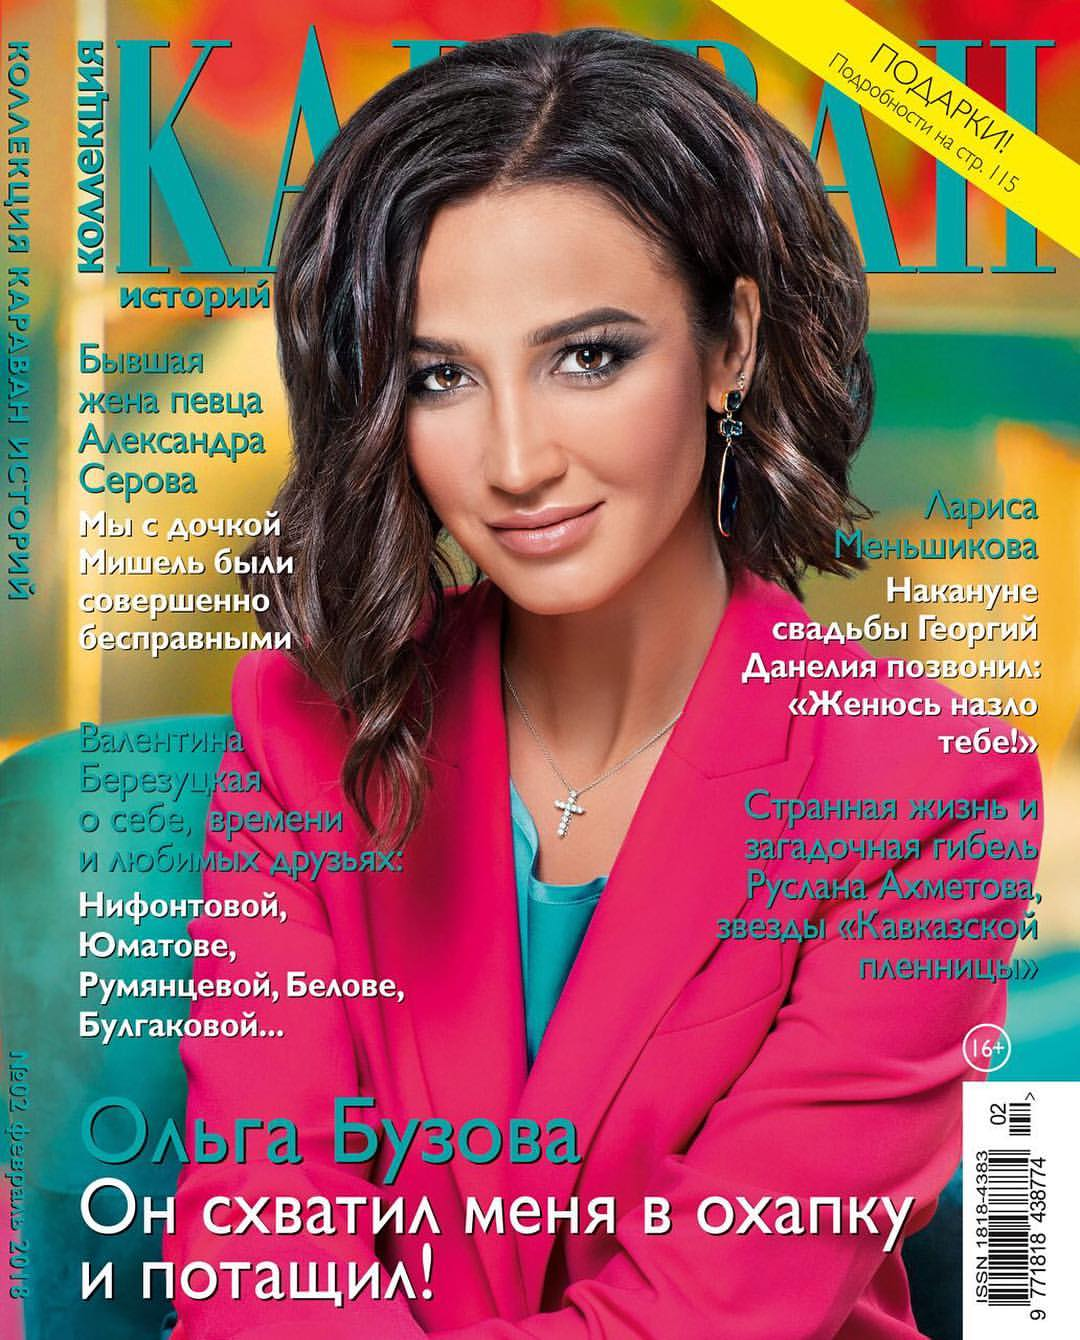 Bachelorette Russia - Olga Buzova - Media SM - Discussion - *Sleuthing Spoilers*  AerxsEB4oRQ